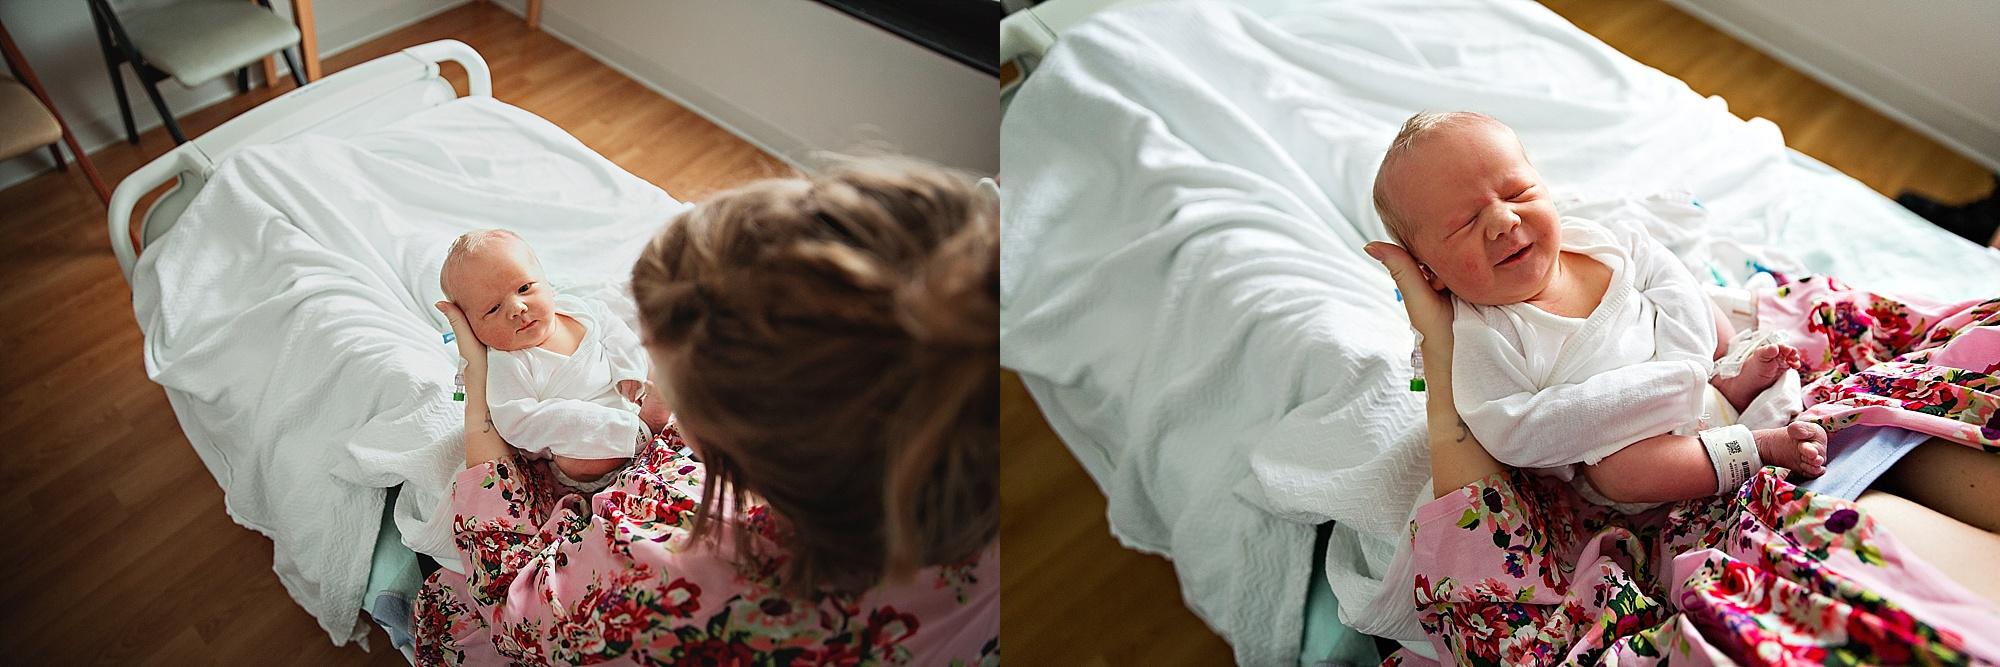 lauren-grayson-photography-akron-ohio-photographer-family-newborn-fresh-48-baby-hospital-photo-shoot-cleveland-clinic-akron-general-carter_0319.jpg